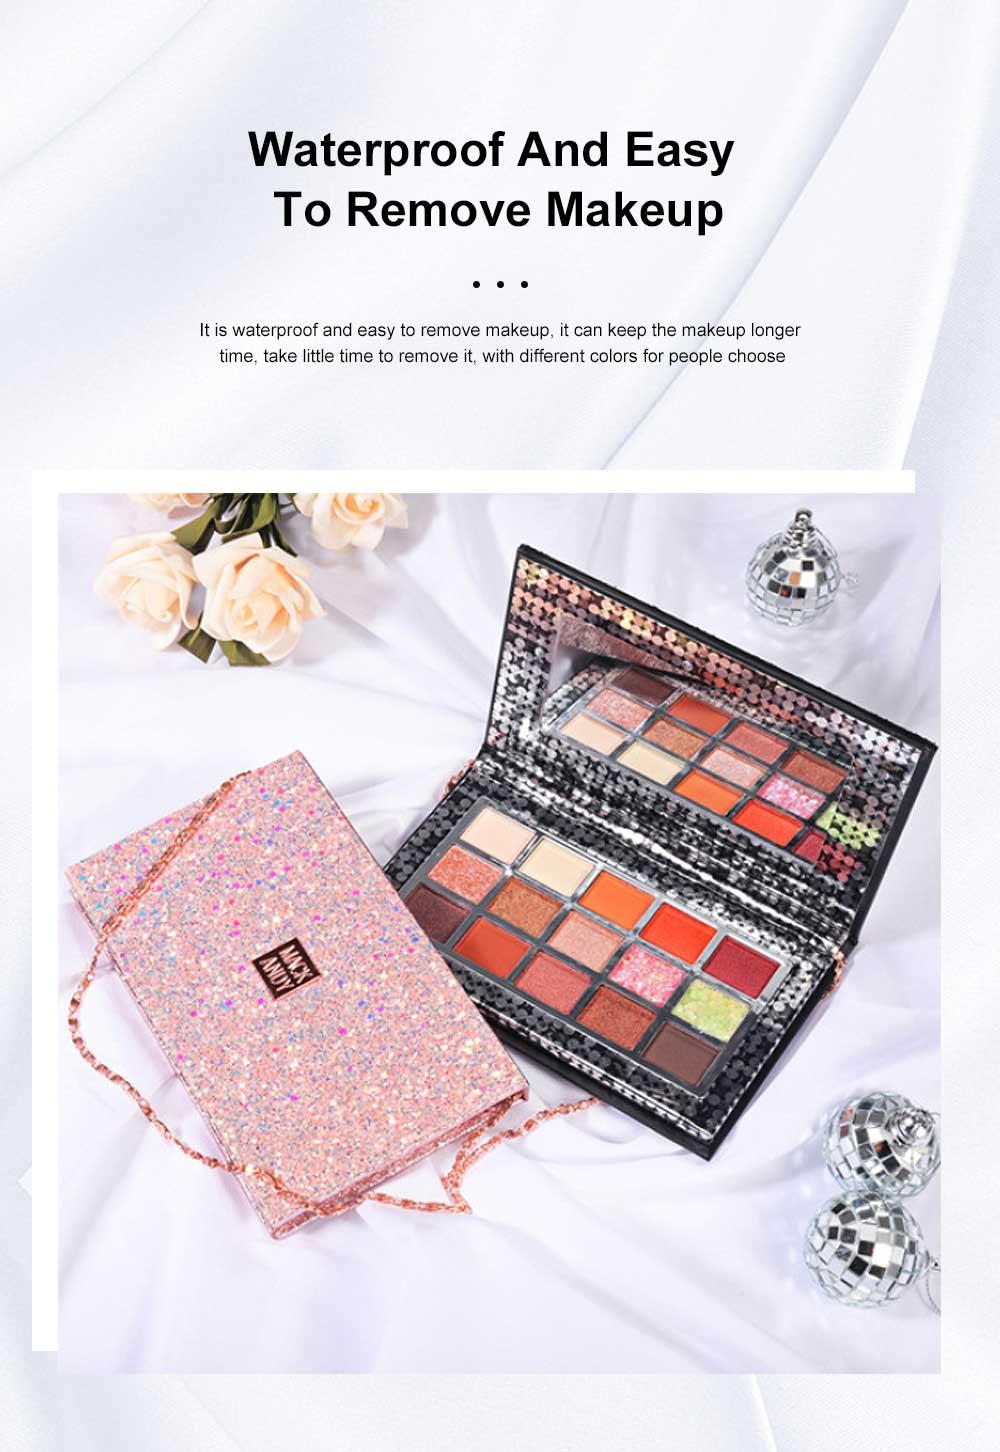 Cosmetics Makeup 15 Color Glitter Eyeshadow Waterproof Easy Clean Palette Eye Shadow Make Up Palettes 4